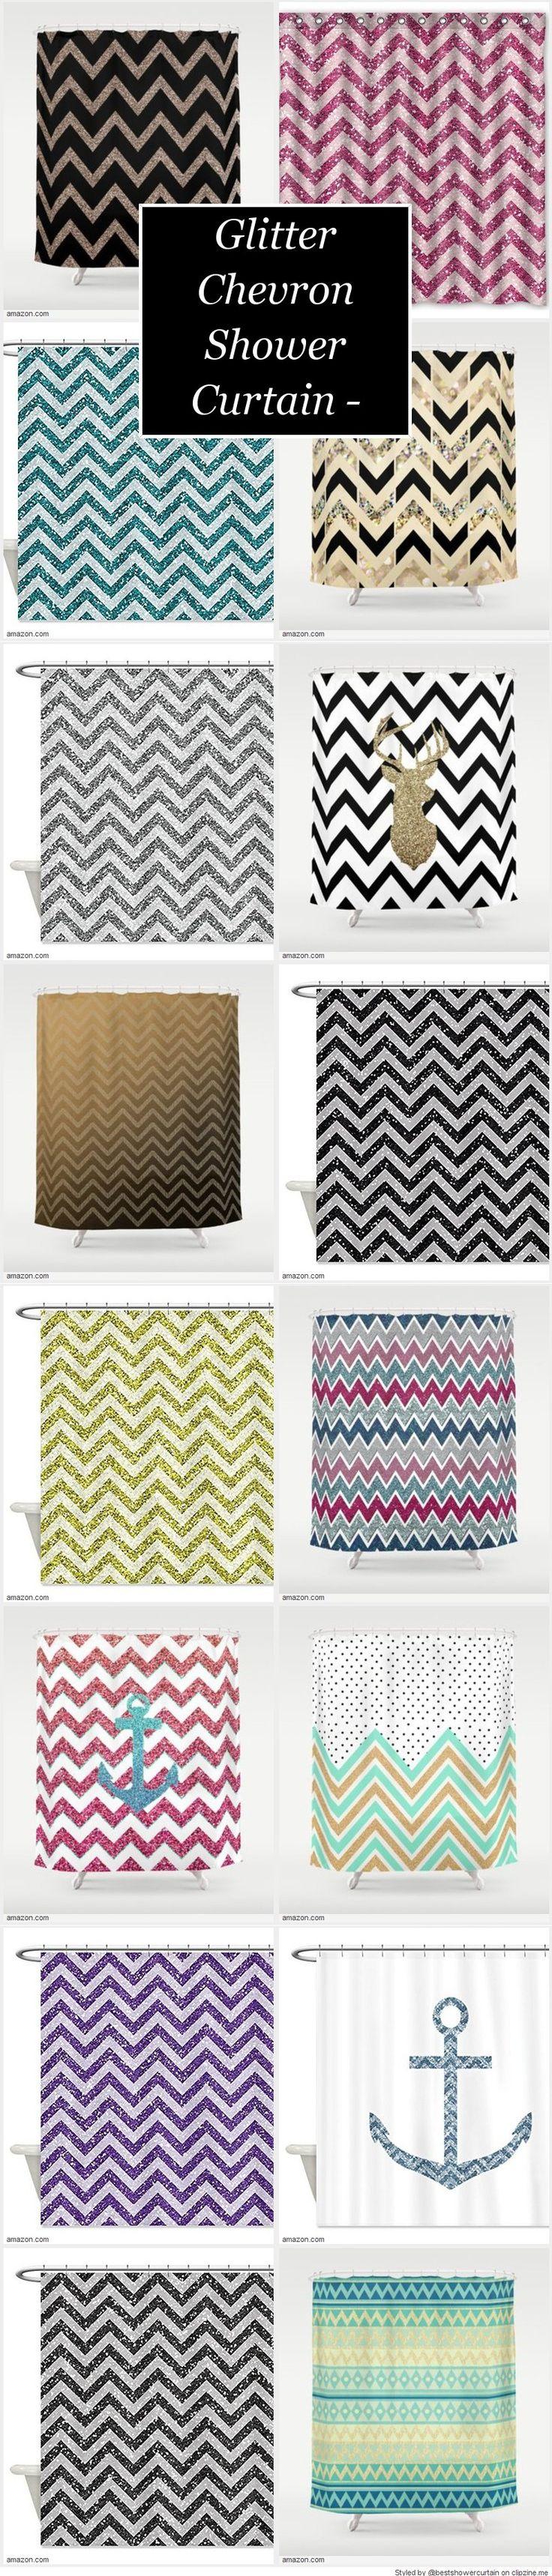 Aqua chevron shower curtain - Black And Tan Chevron Shower Curtain Pretty Glitter Chevron Shower Curtain Designs Sales And Discounts